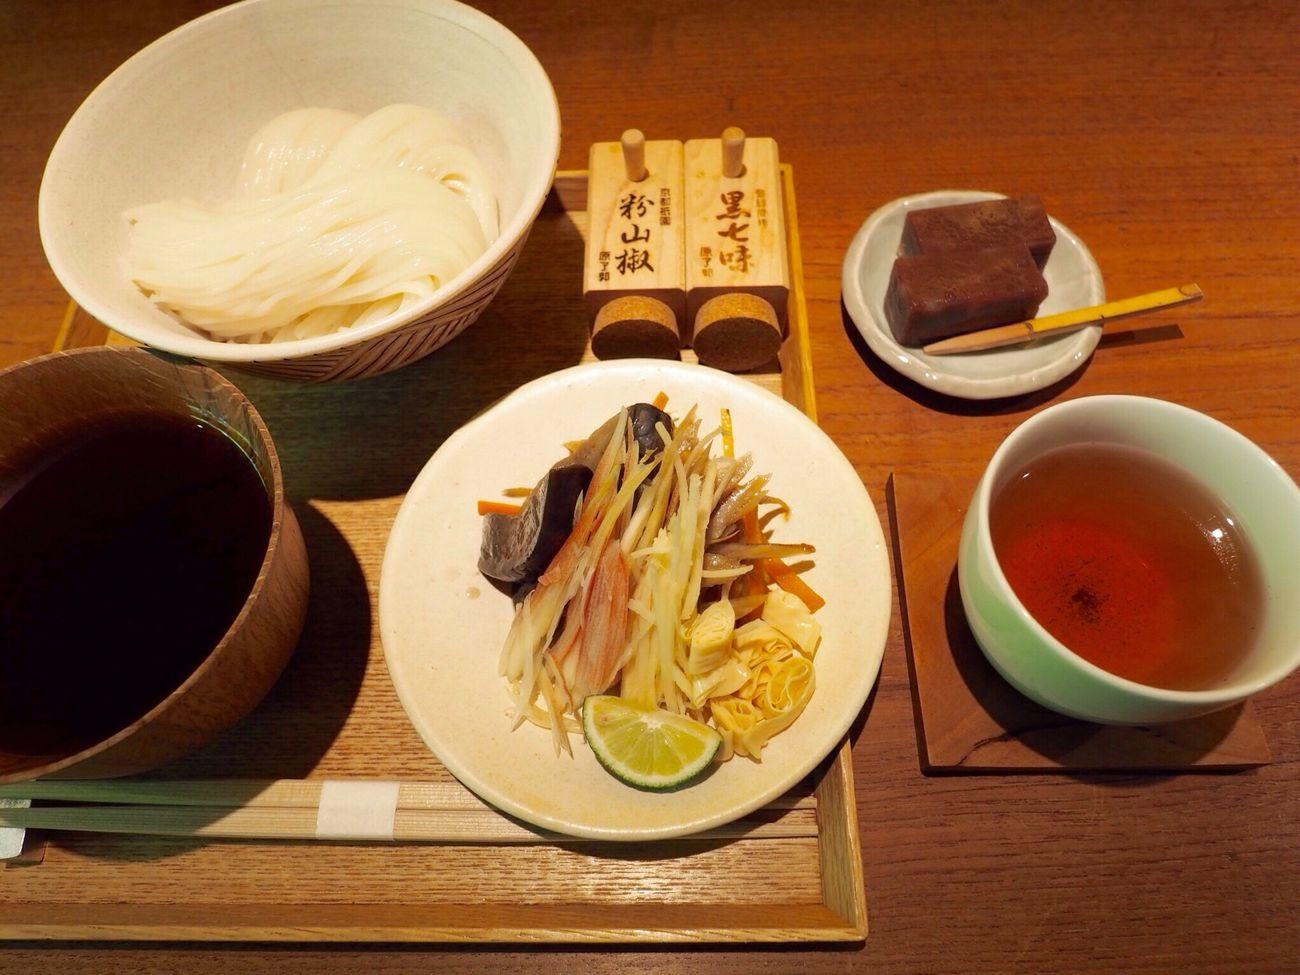 Kyoto Japan Gion Niti Cafe Noodle Japanese Food Wagashi Vegitables Tea Lunch Delicious Goodtaste Olympus PEN-F 京都 日本 祇園 カフェ そうめん 野菜 和菓子 ほうじ茶 美味